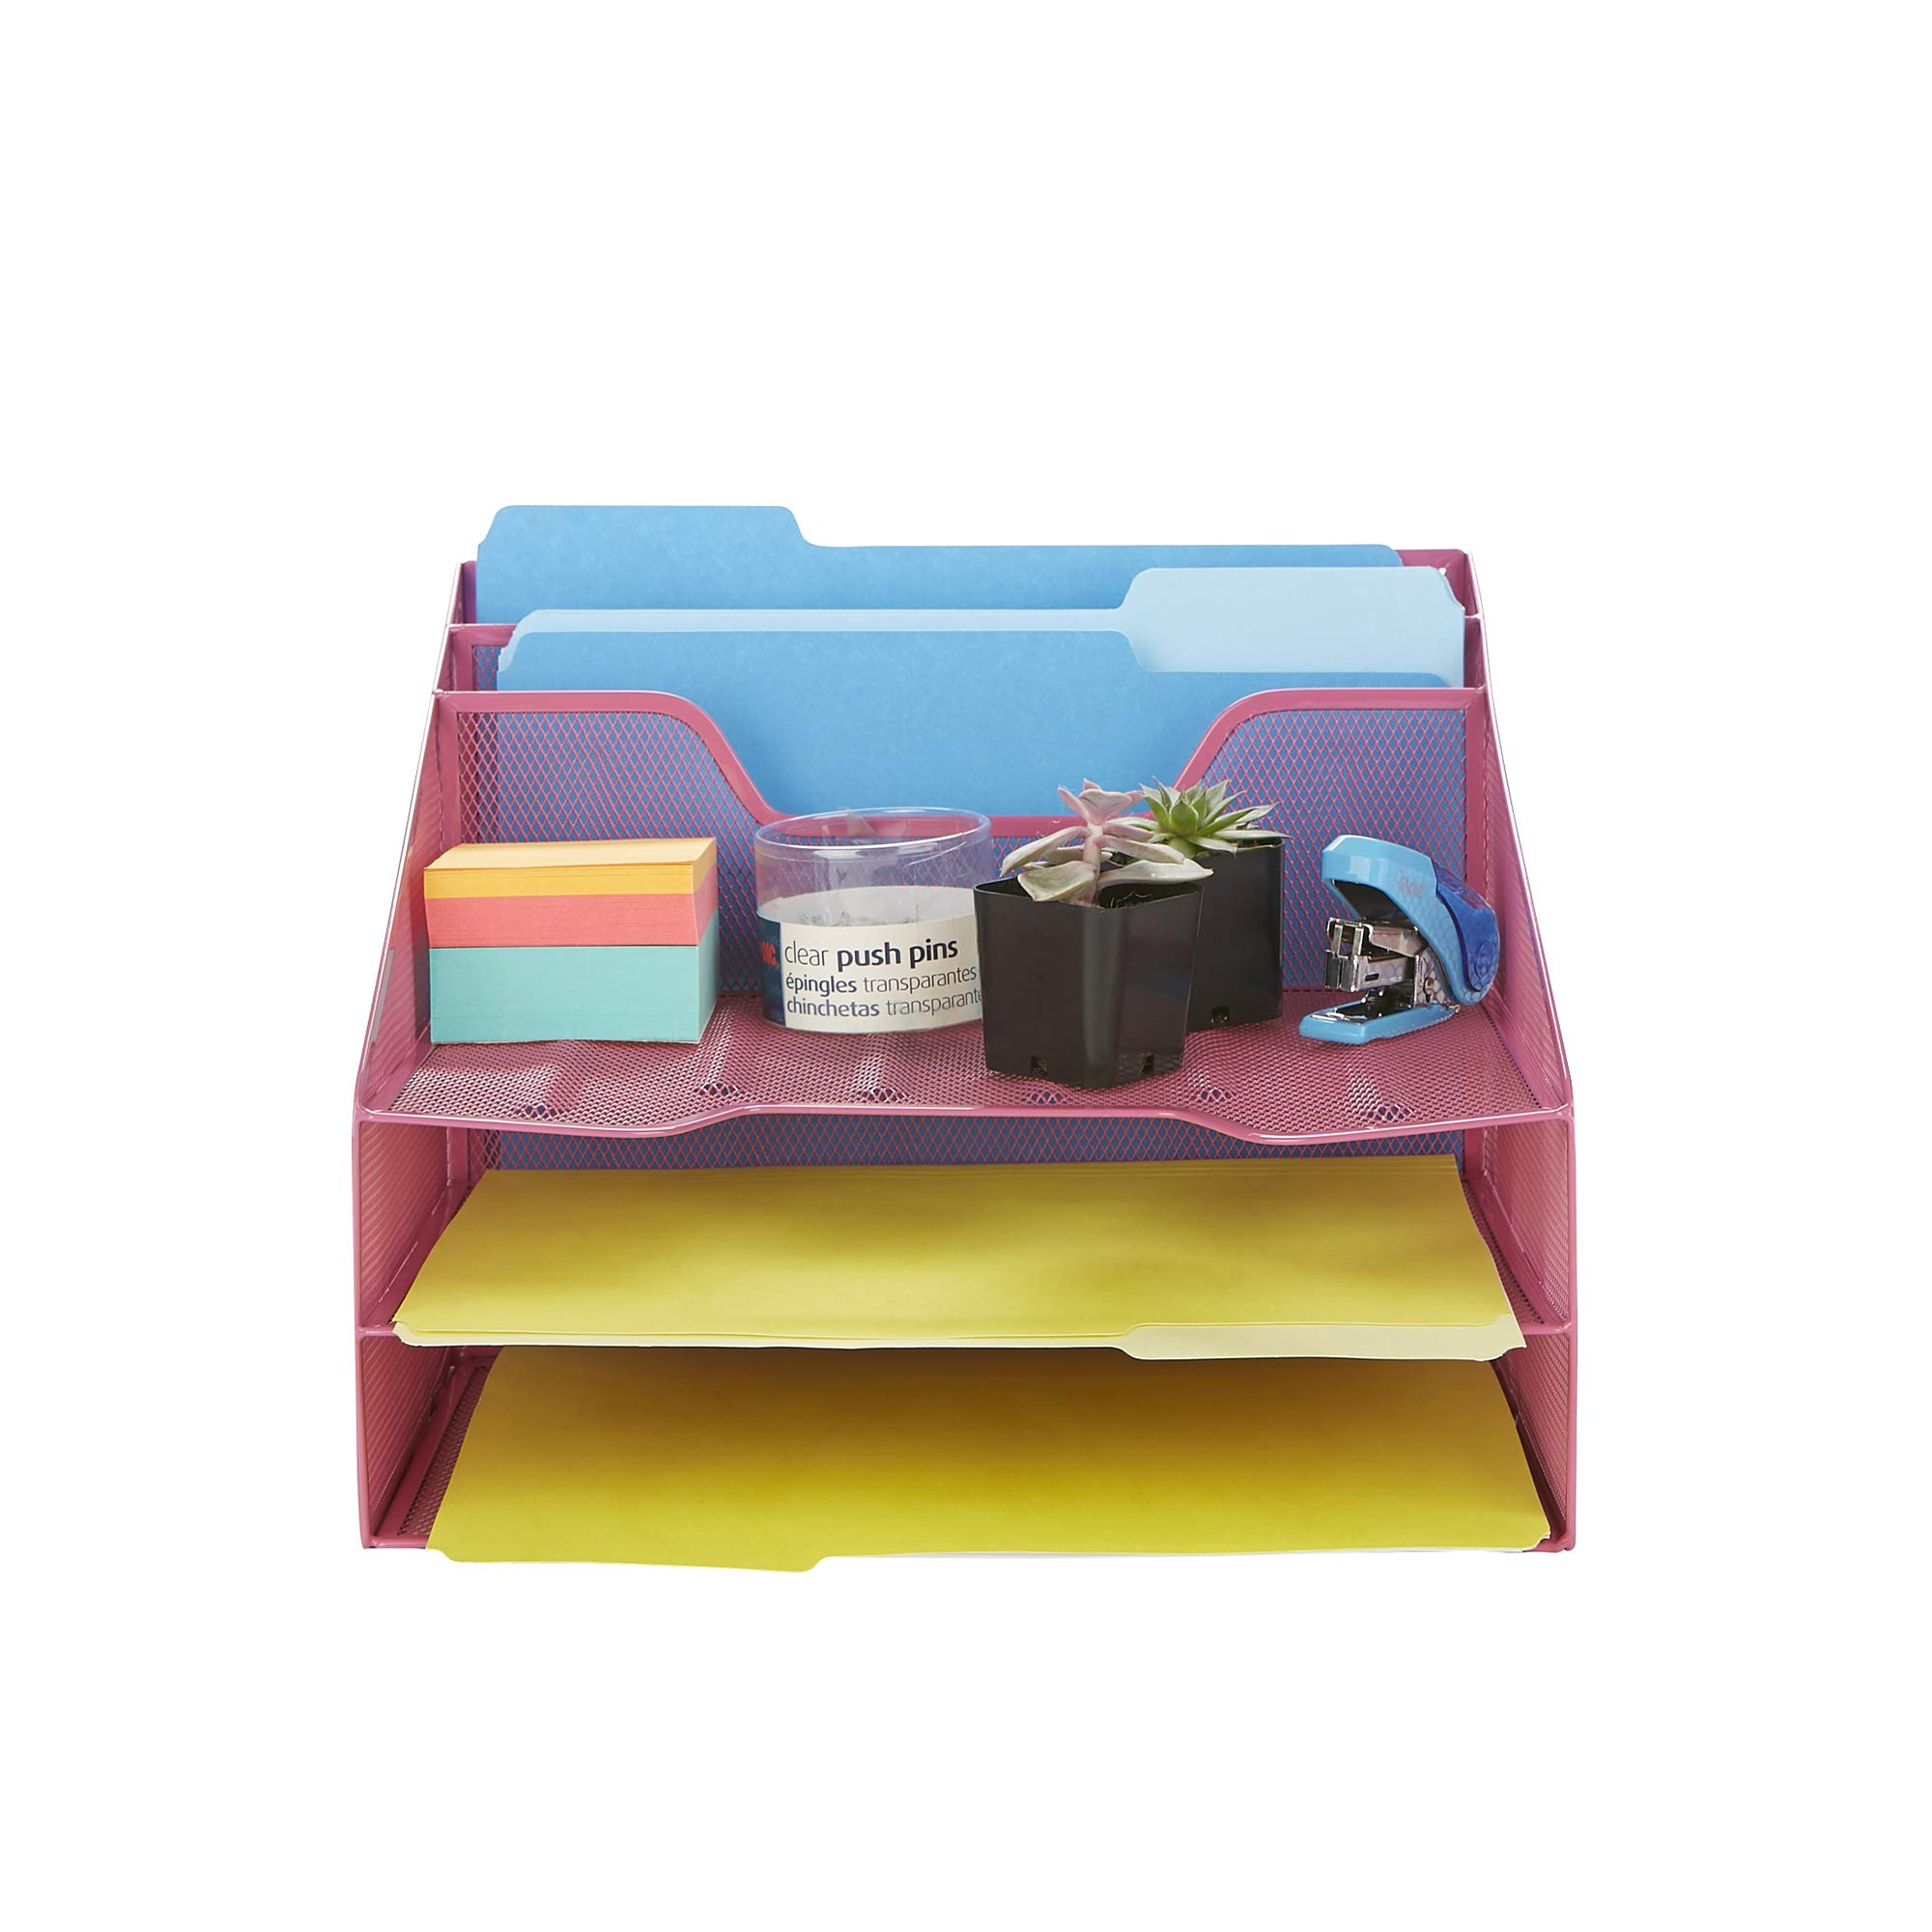 Mind Reader MESHBOX5-PNK Mesh Organizer 5 Desktop Document Letter Tray for Folders, Mail, Stationary, Desk Accessories, Pink by Mind Reader